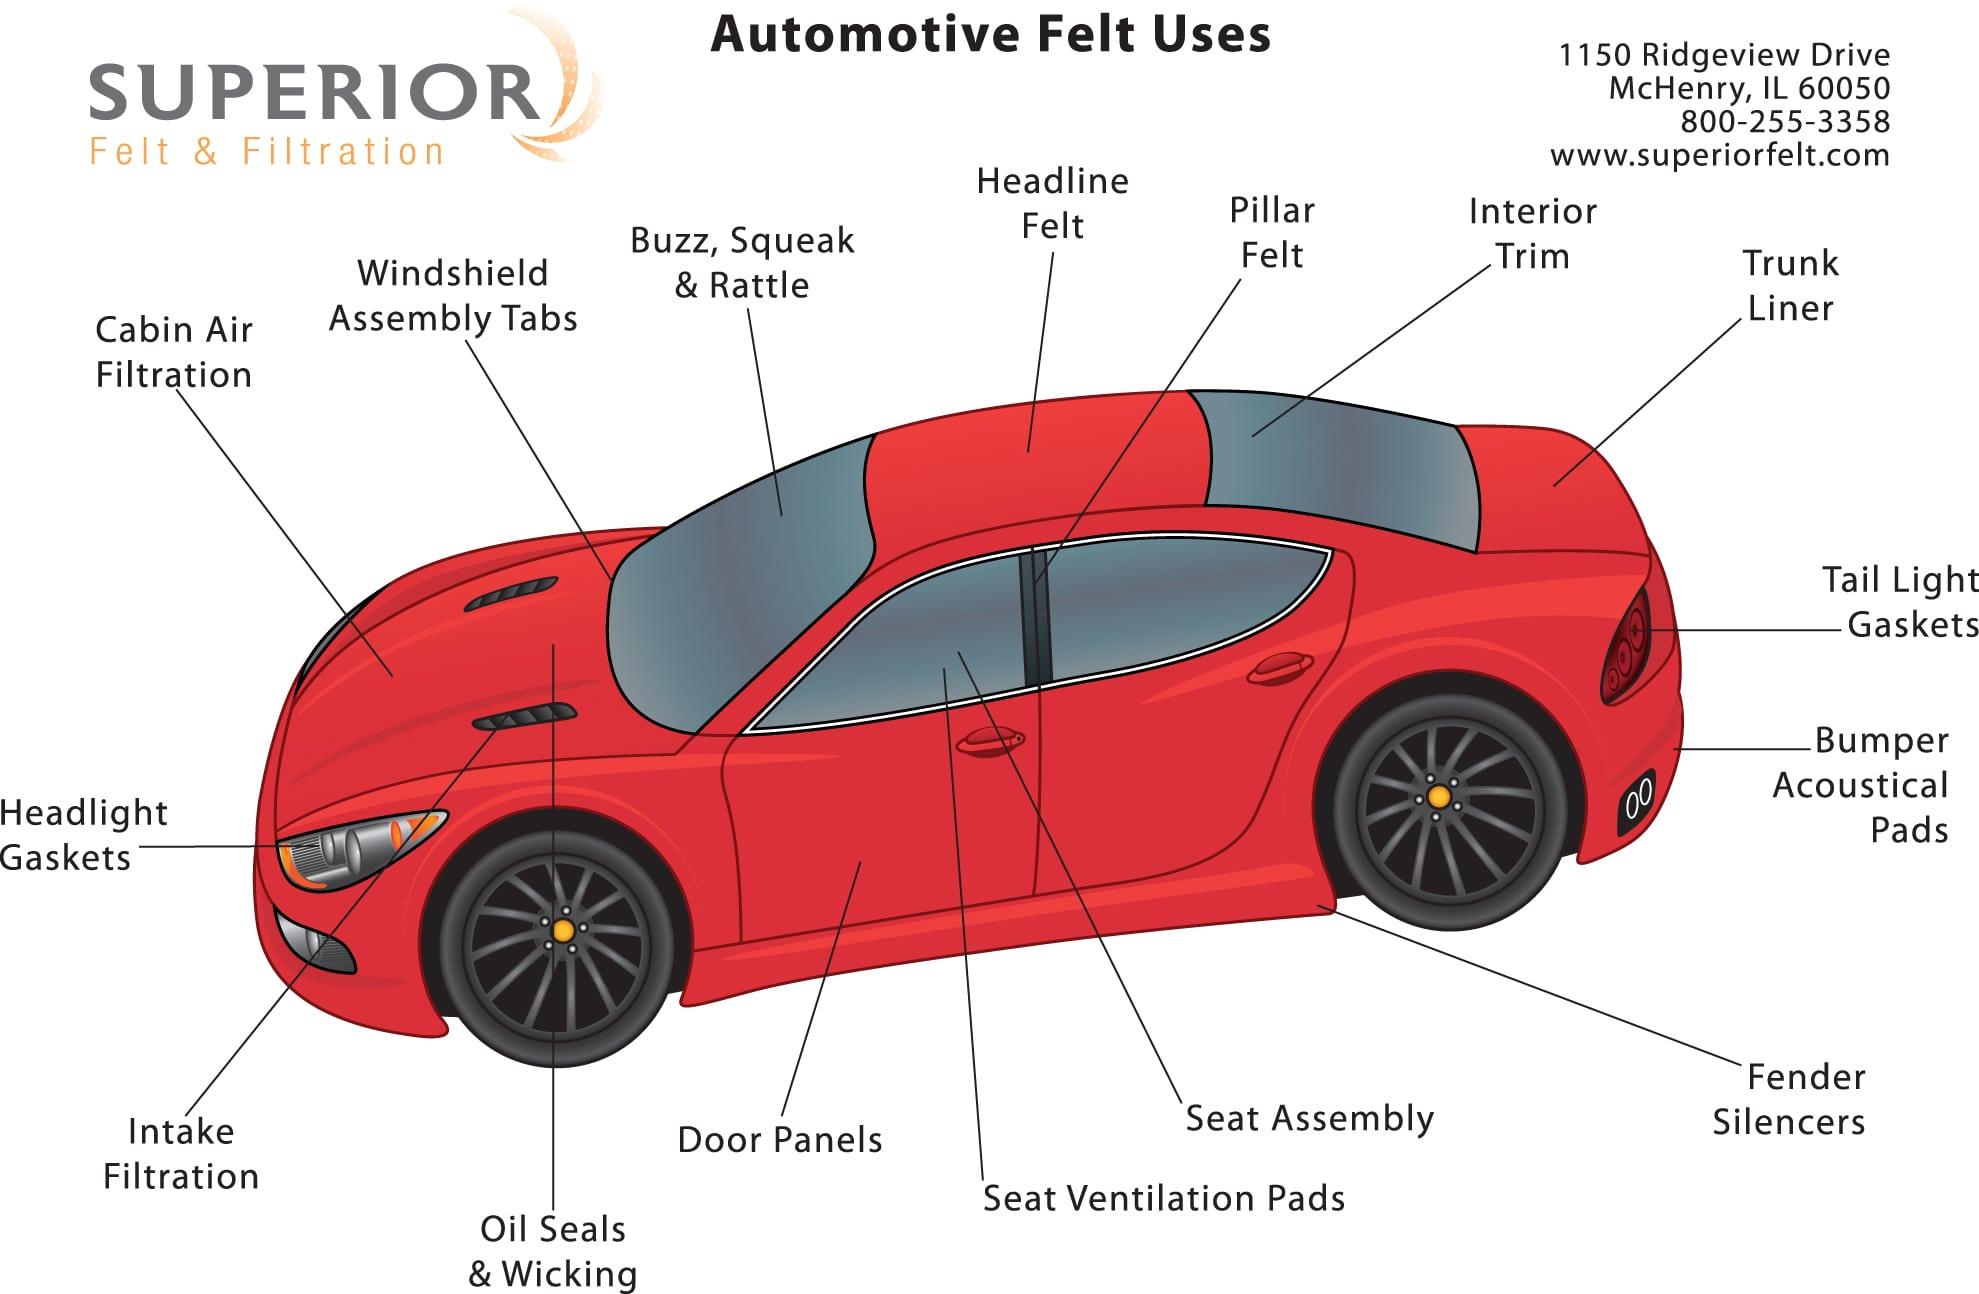 simple wiring diagram of a car uverse dvr fender